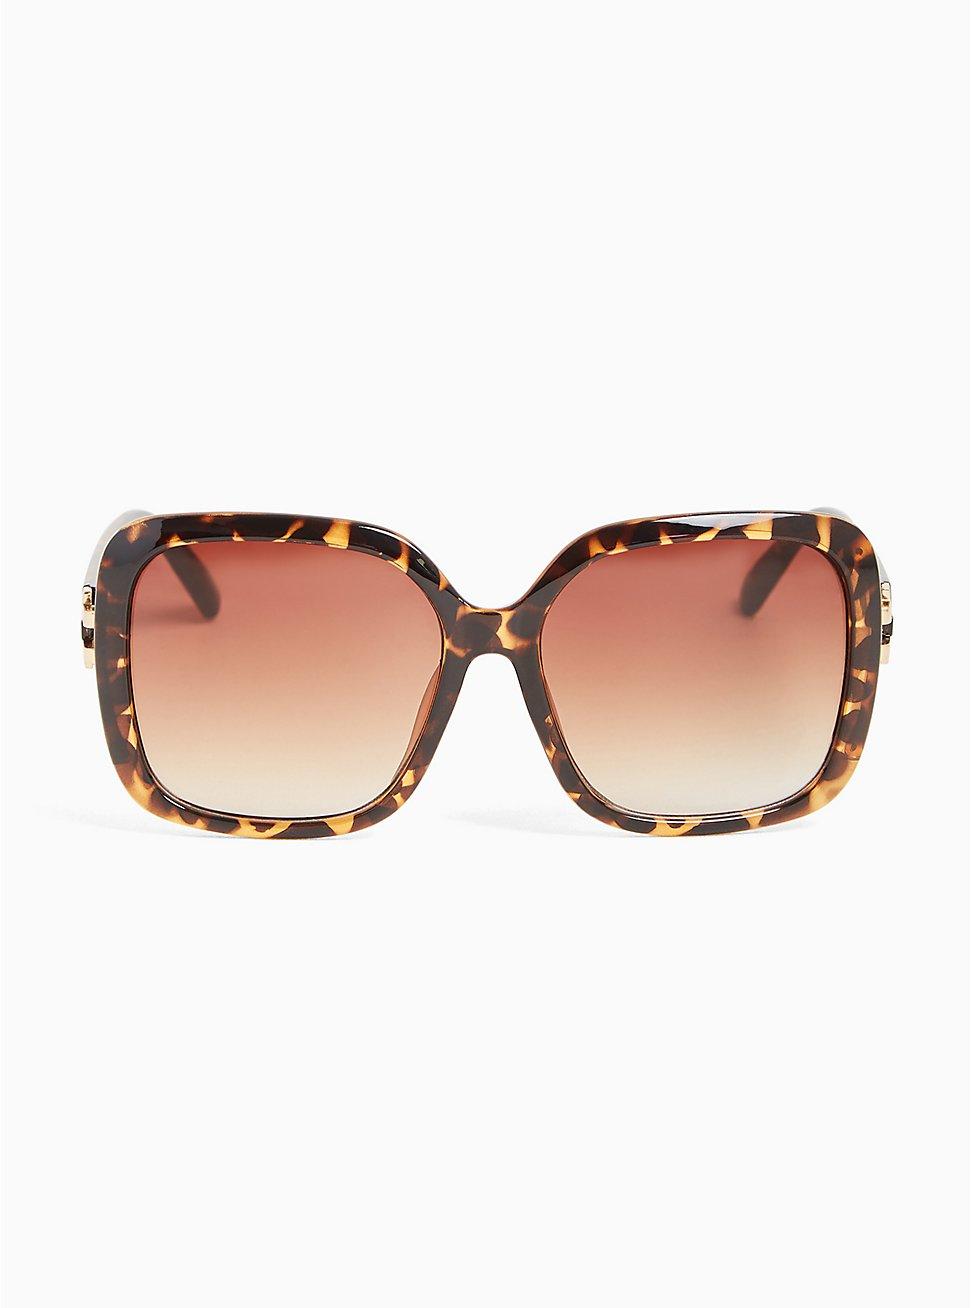 Tortoiseshell Oversized Square Sunglasses, , hi-res